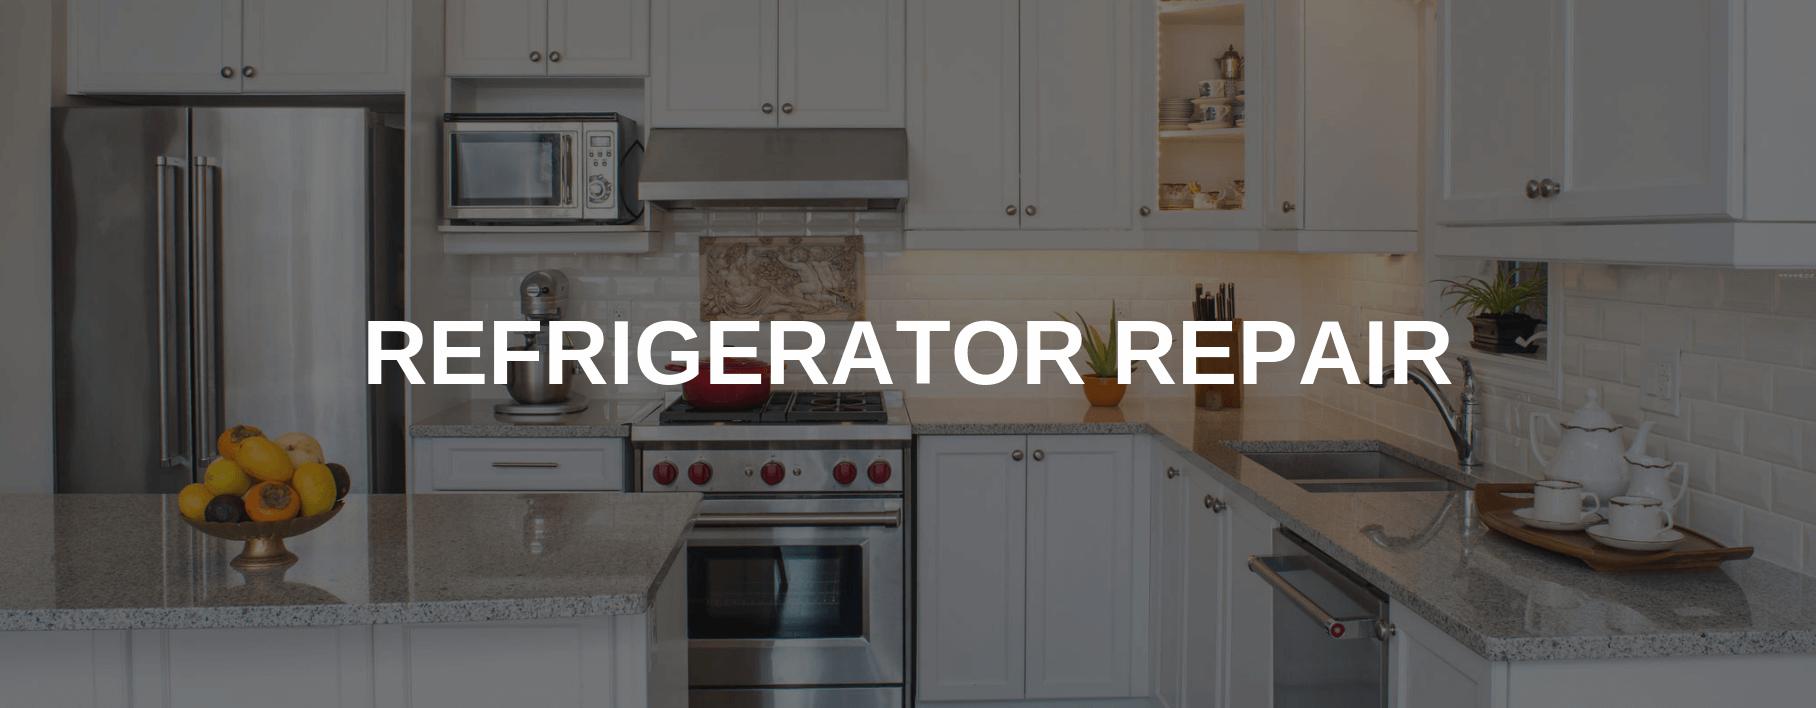 refrigerator repair norwich